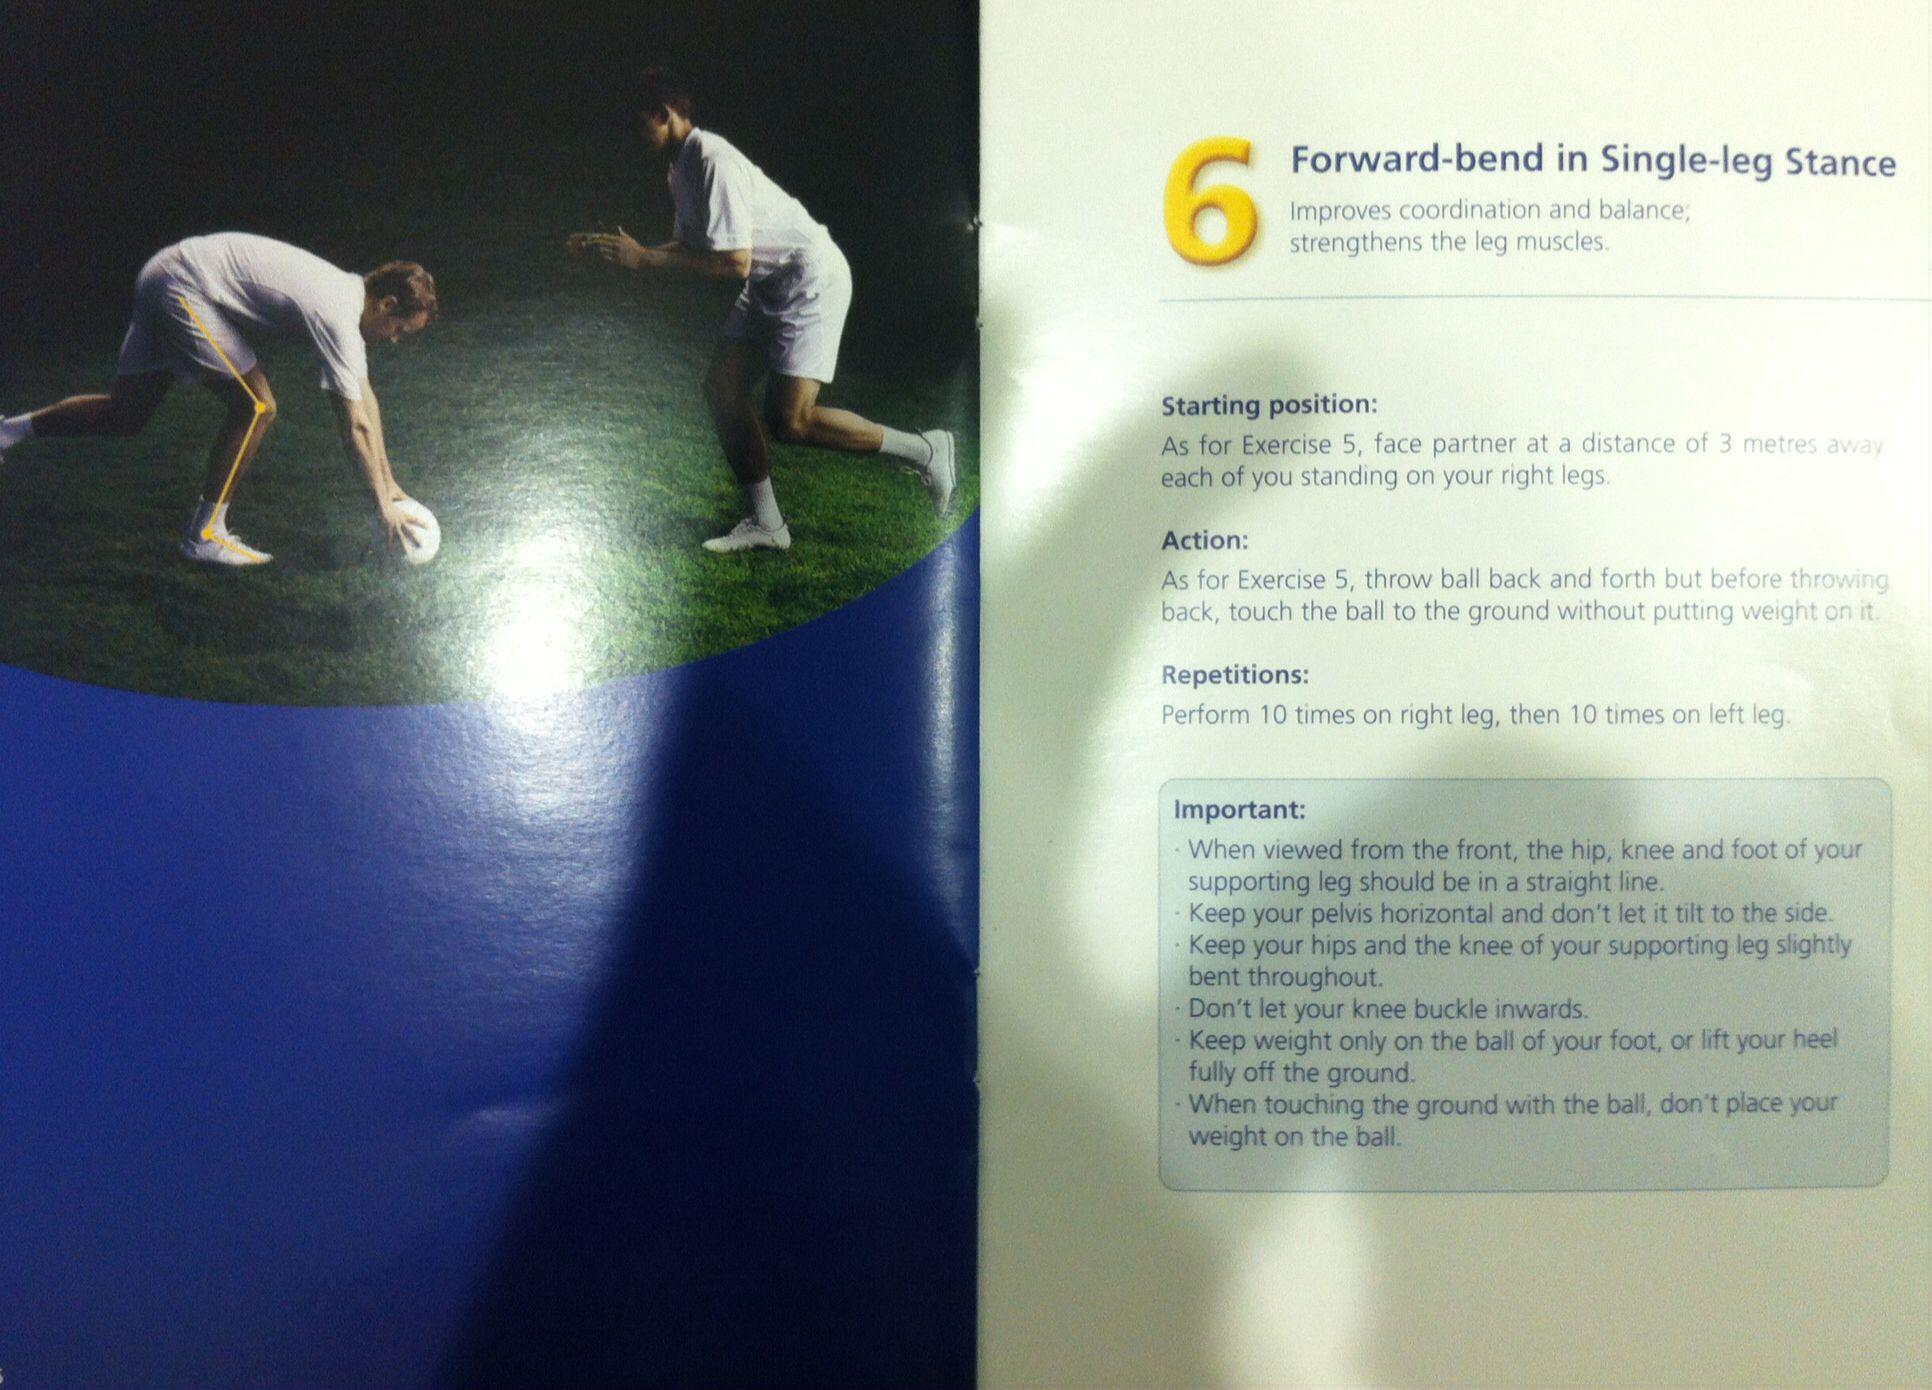 Functional single leg squat exercise taken from FIFA The